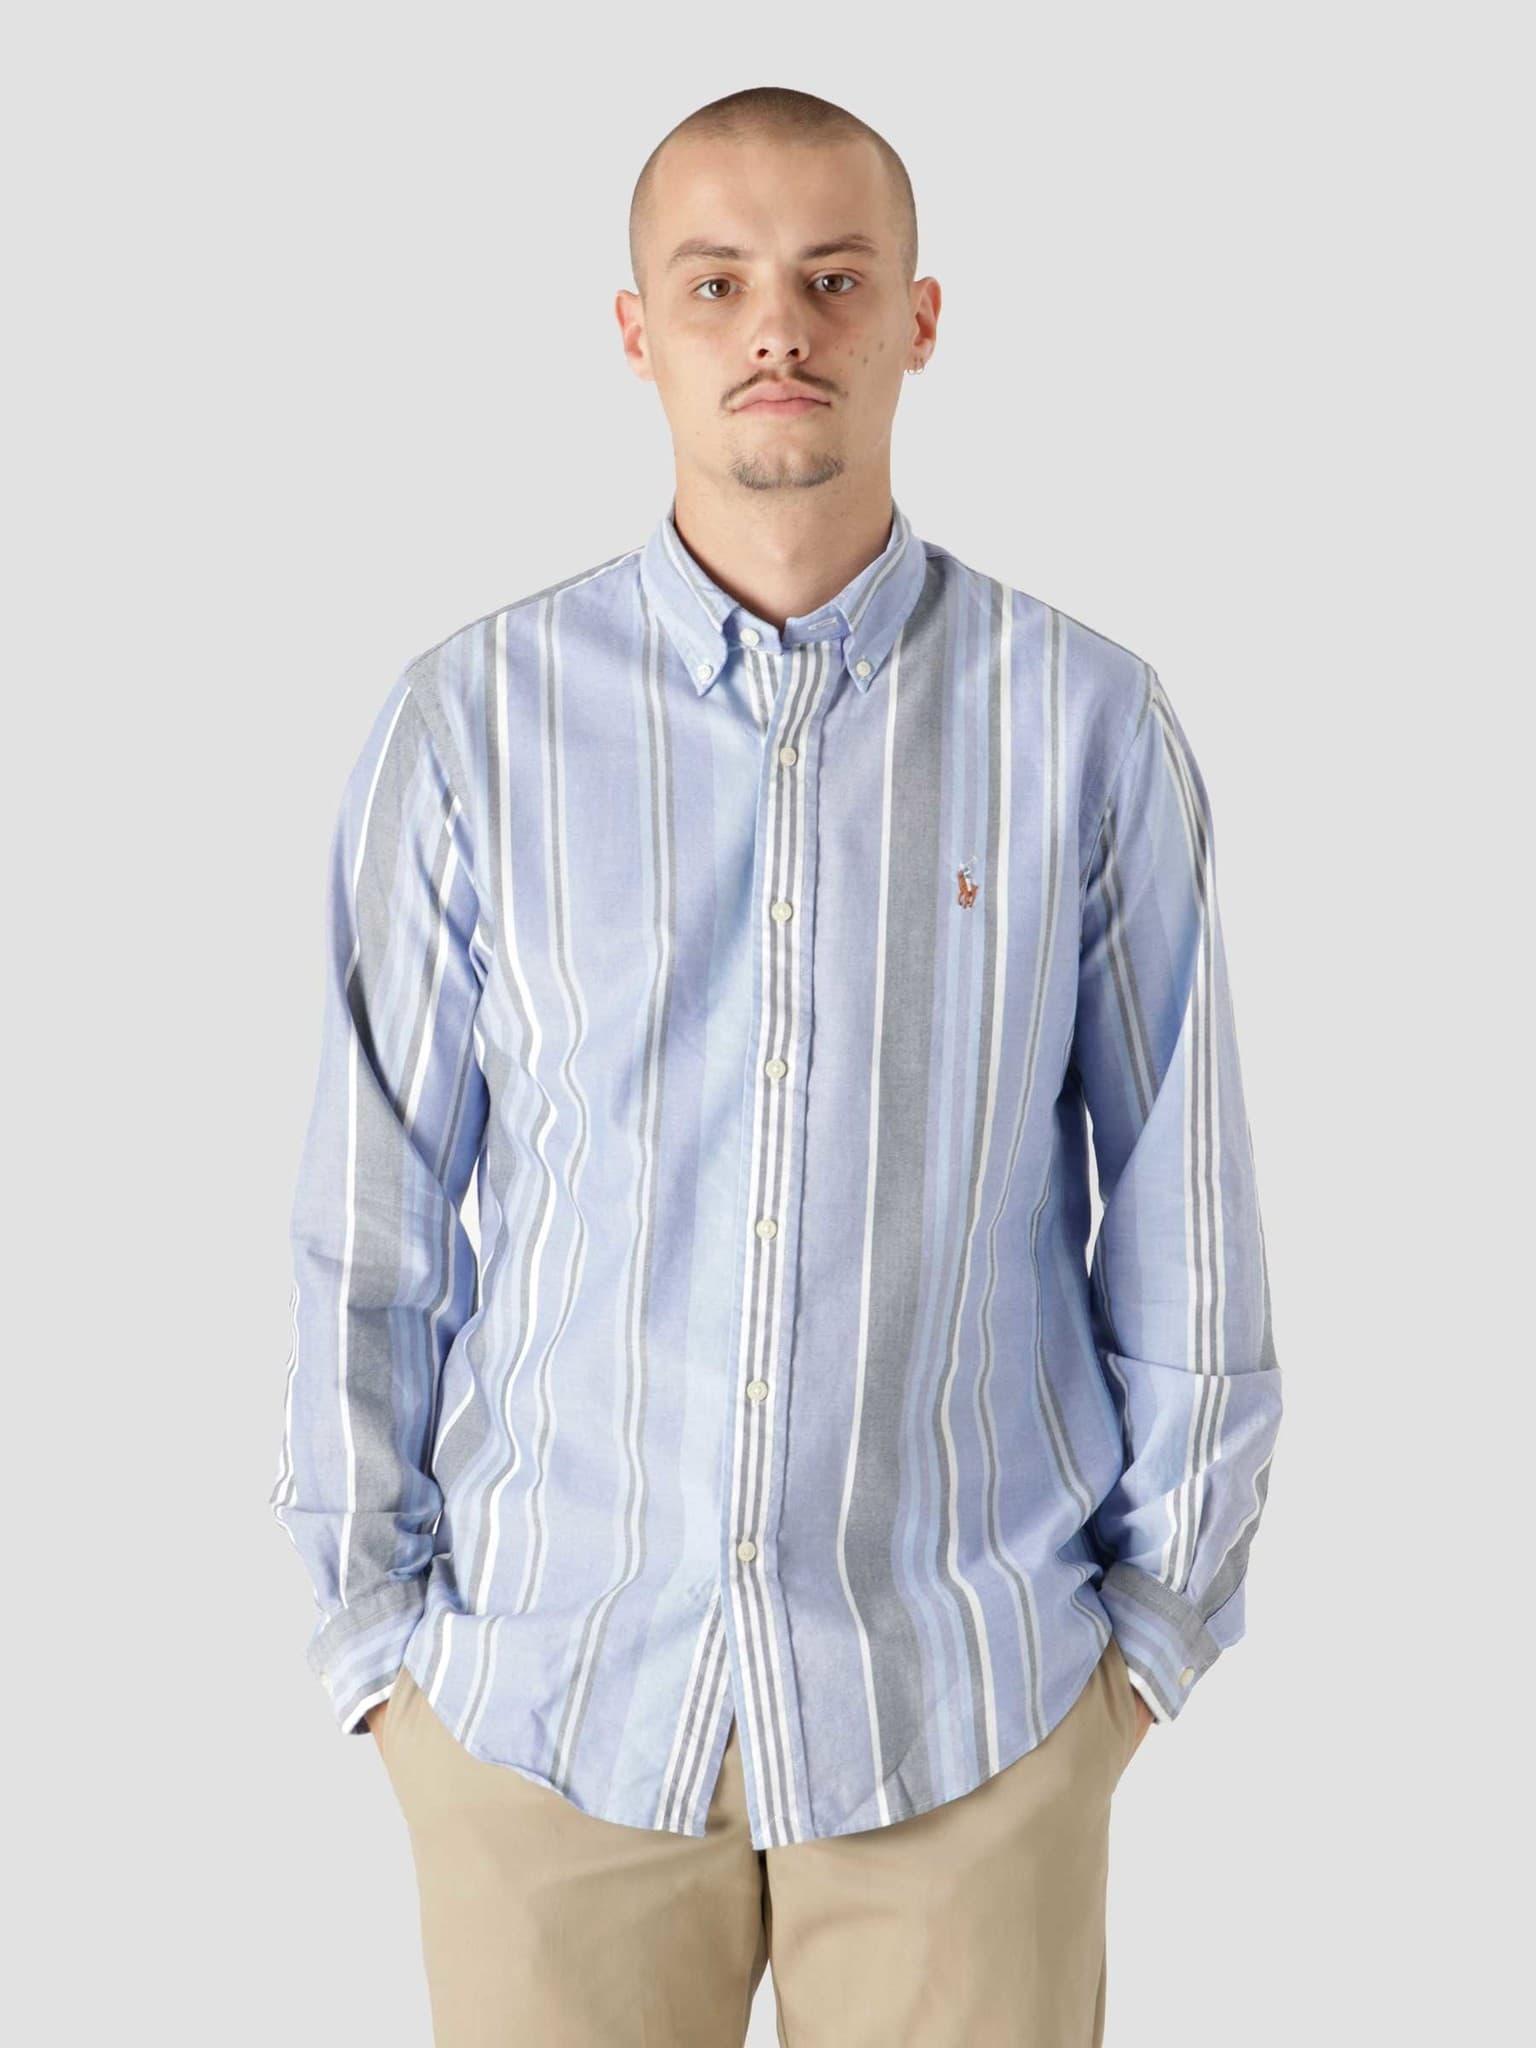 40-1 Oxford Shirt 5399 Blue White Multi 710853133002